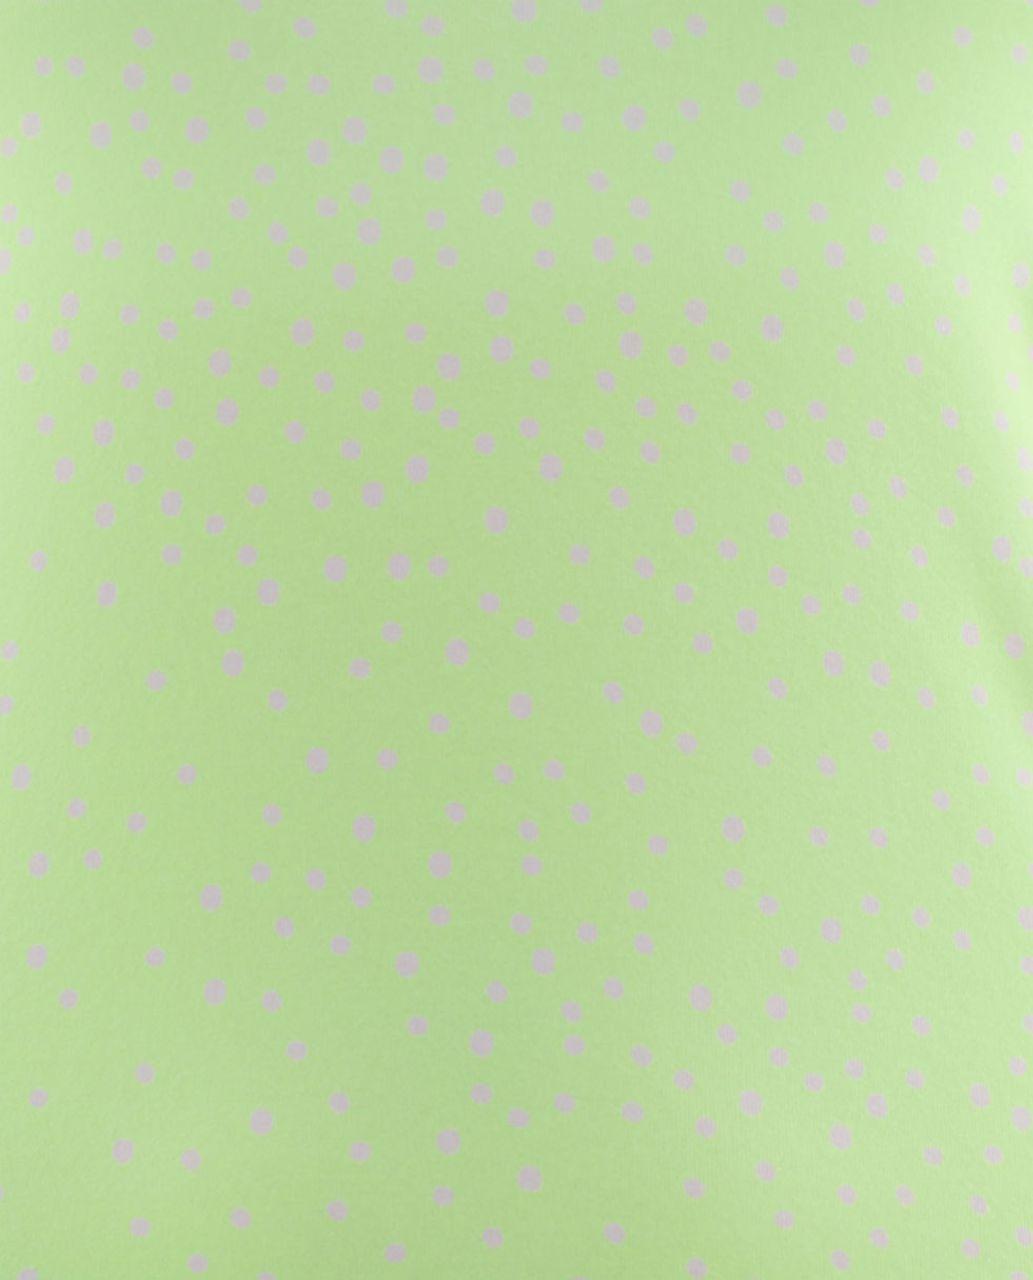 Lululemon Cool Racerback - Petit Dot Faded Zap